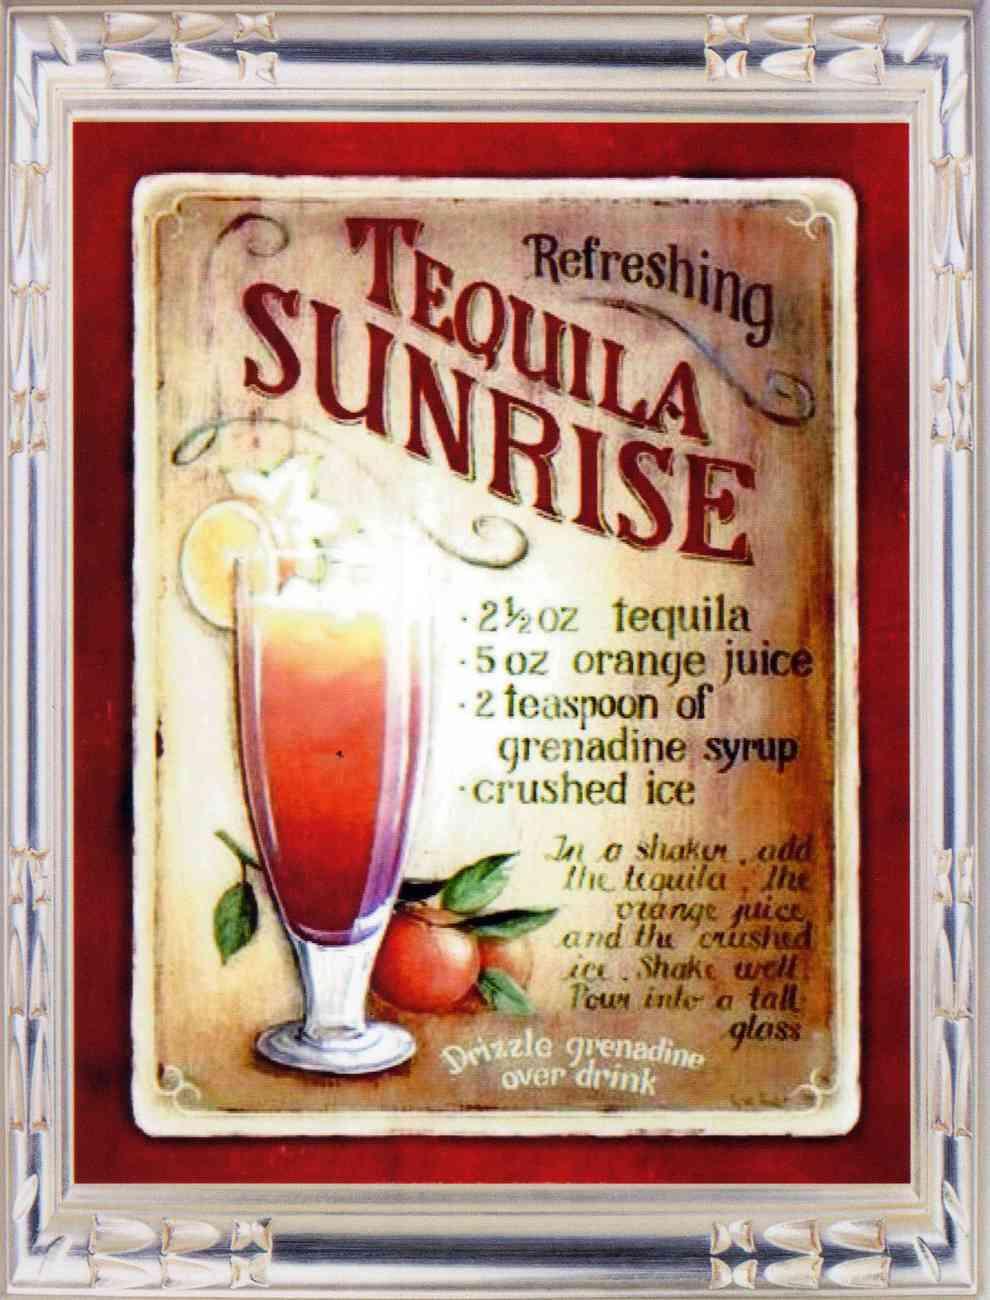 Cocktails tequila sunrise 04